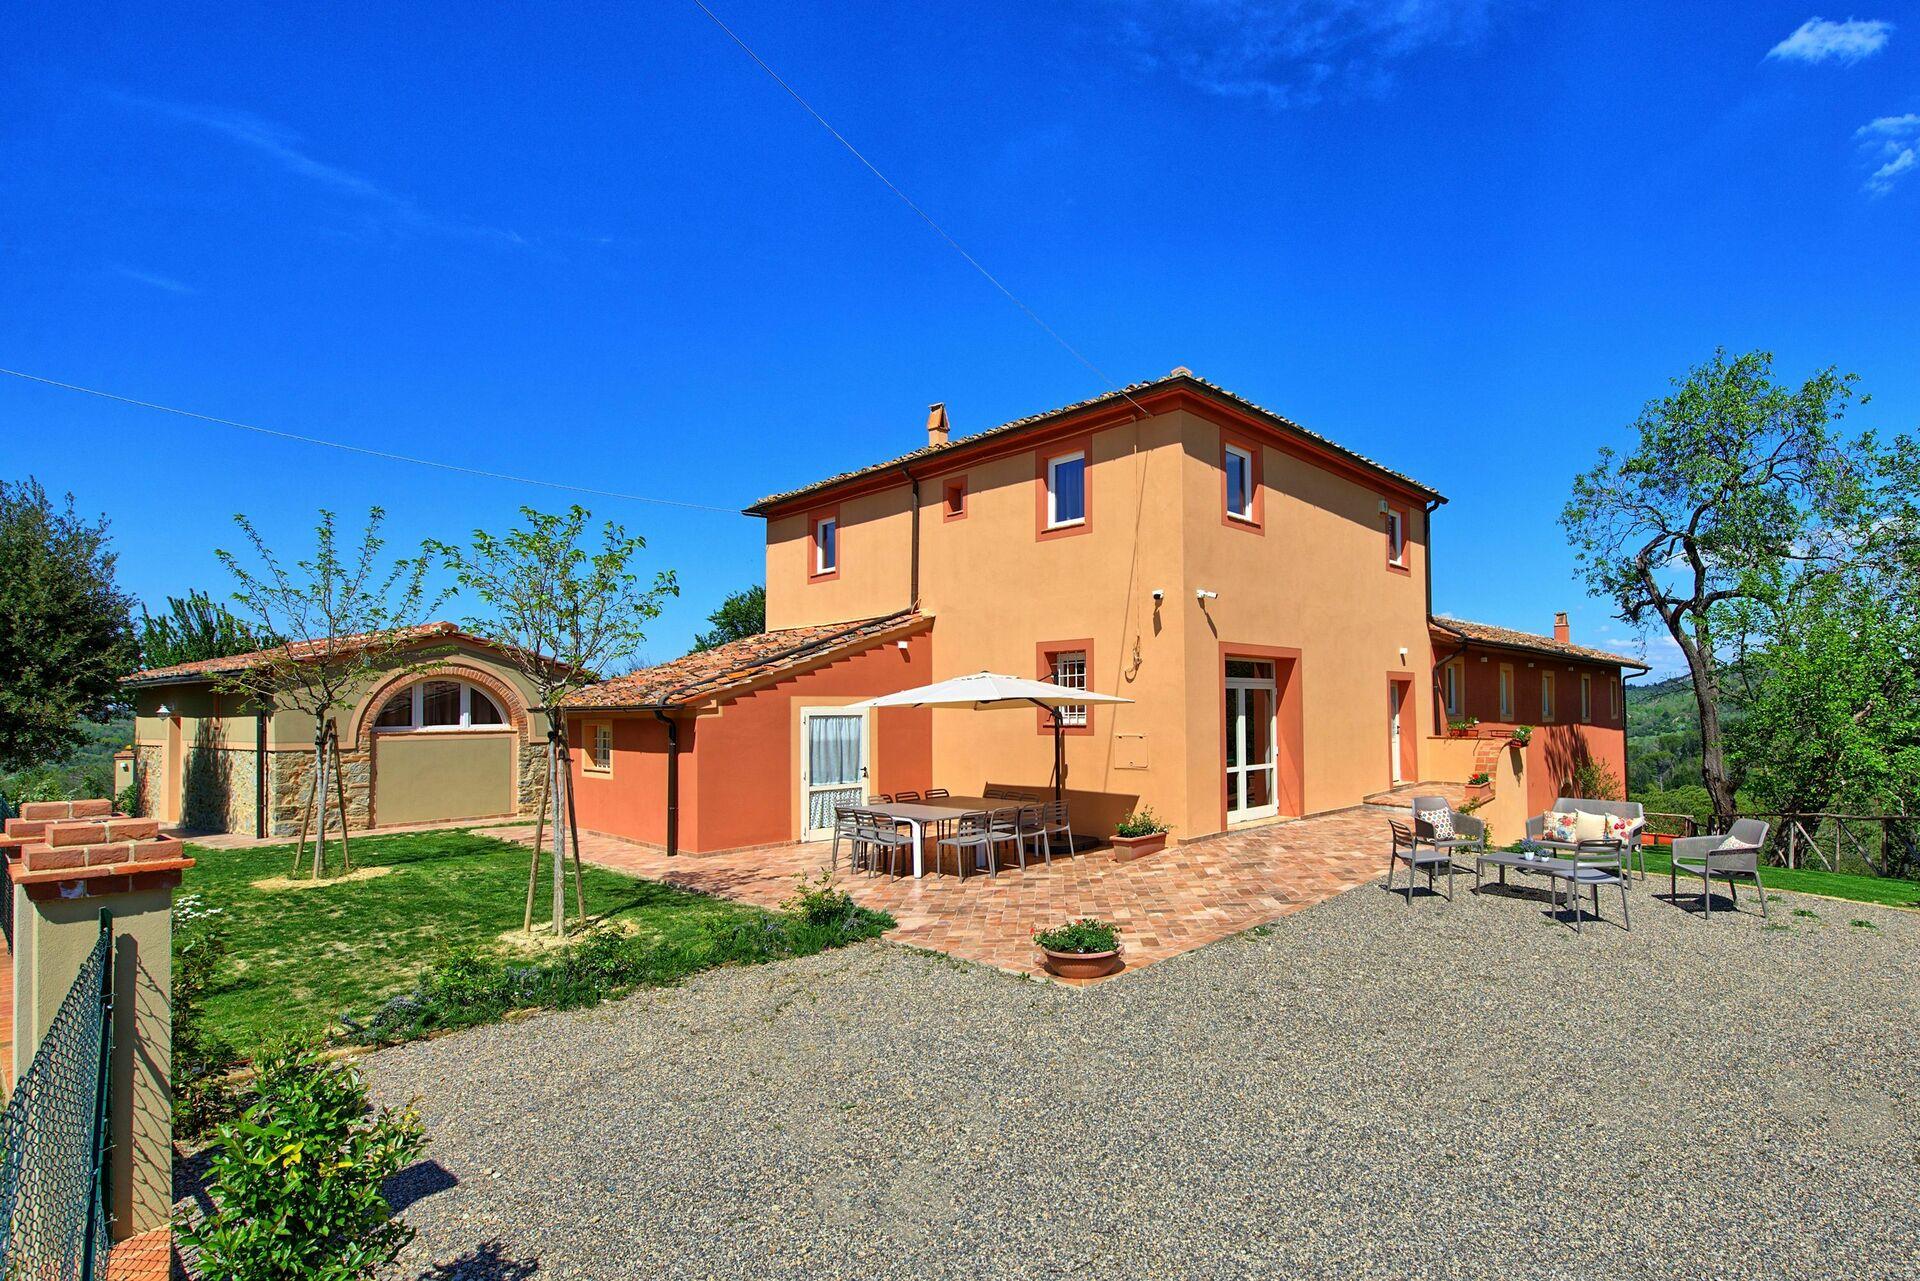 Matrimonio Country Chic Pisa : Villa bonriposo holiday villa rental in legoli pisa tuscany